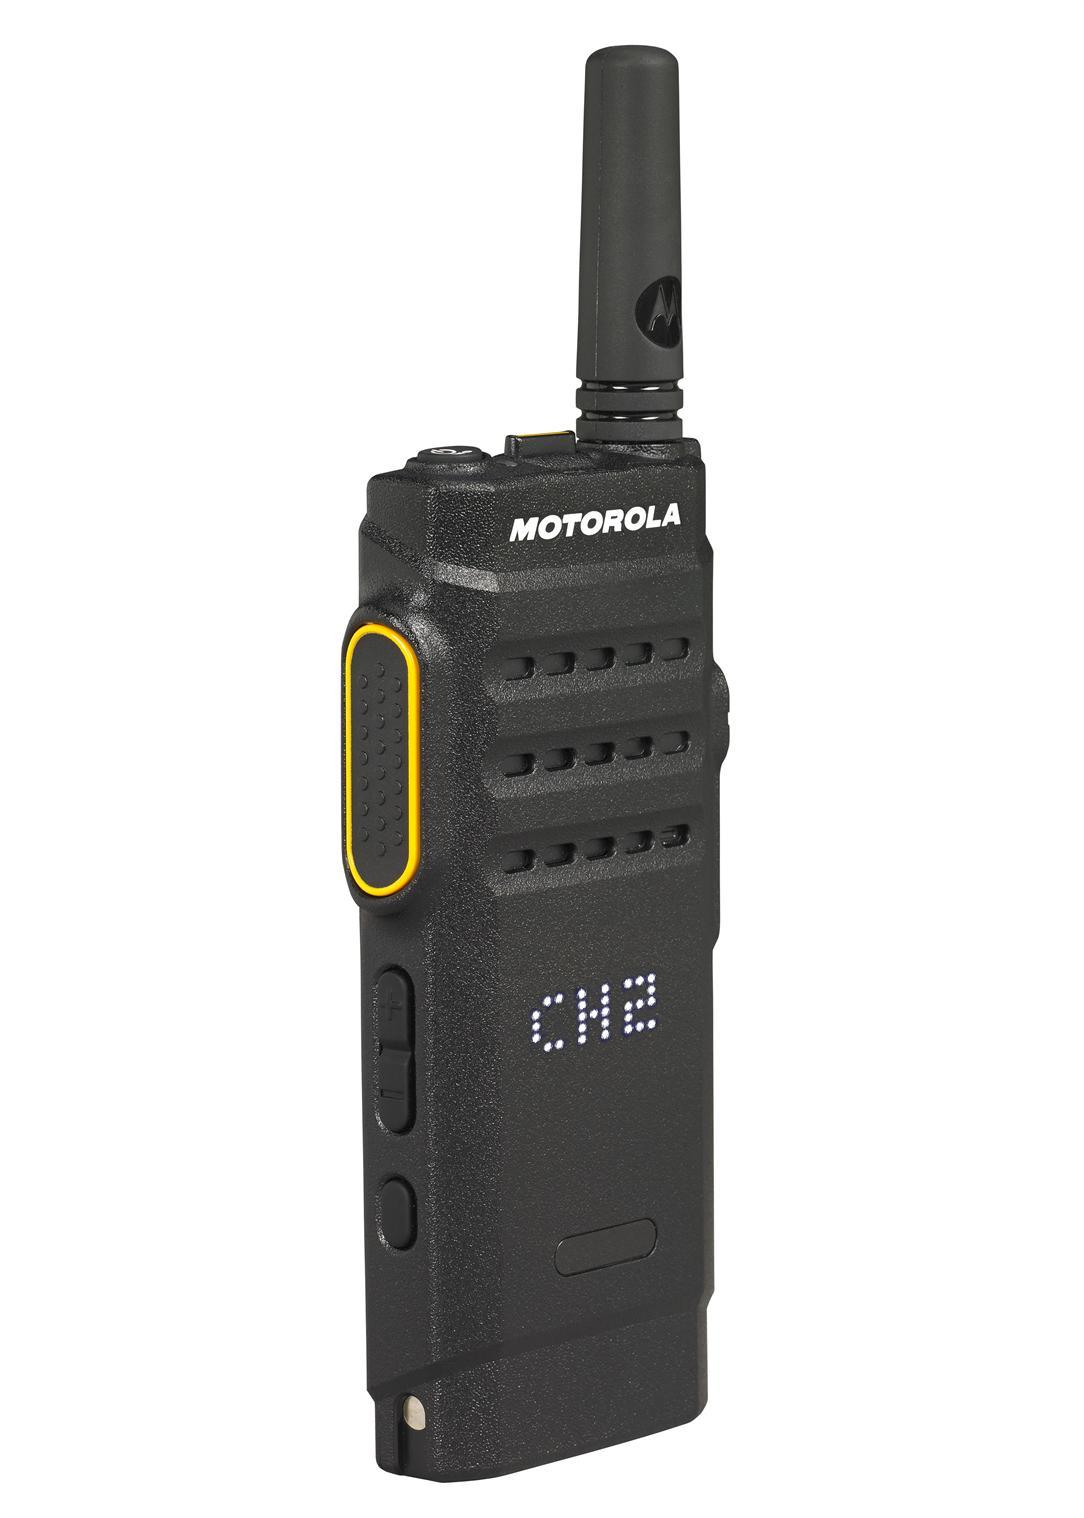 Motorola%20SL1600_hr